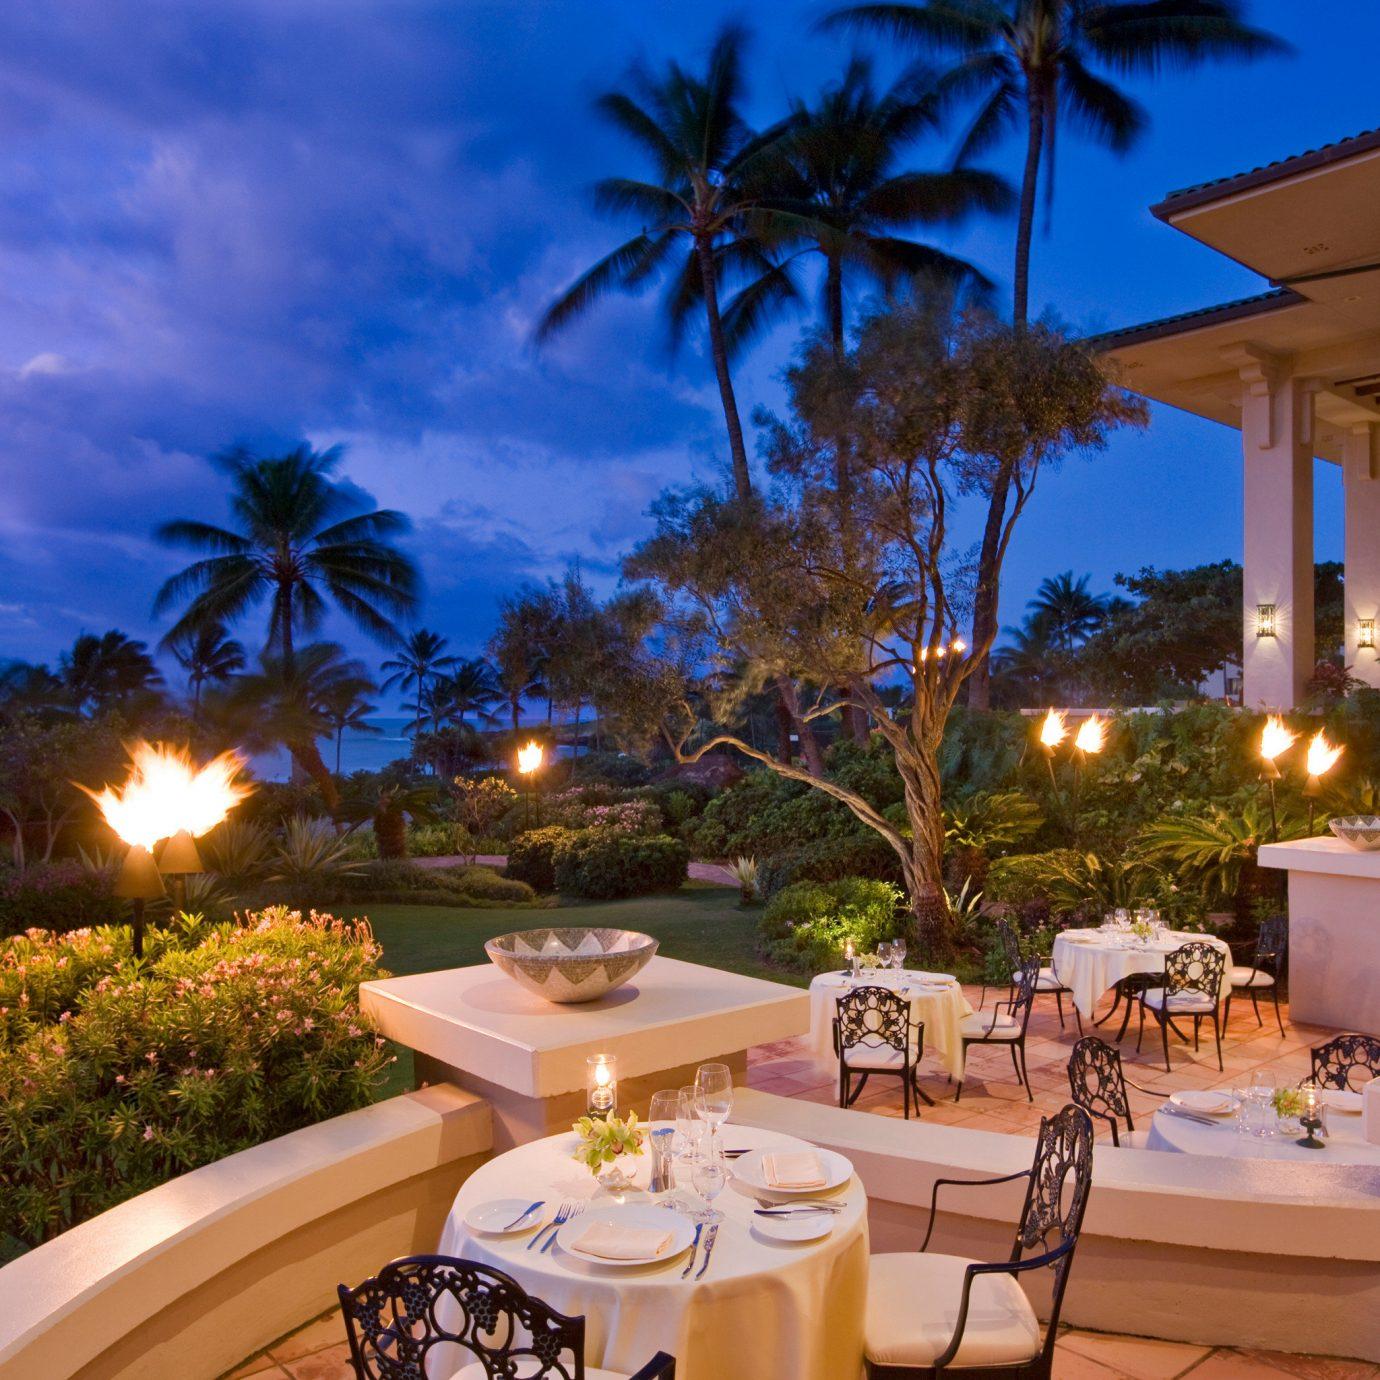 Dining Drink Eat Nightlife Resort Scenic views tree property Villa home caribbean mansion